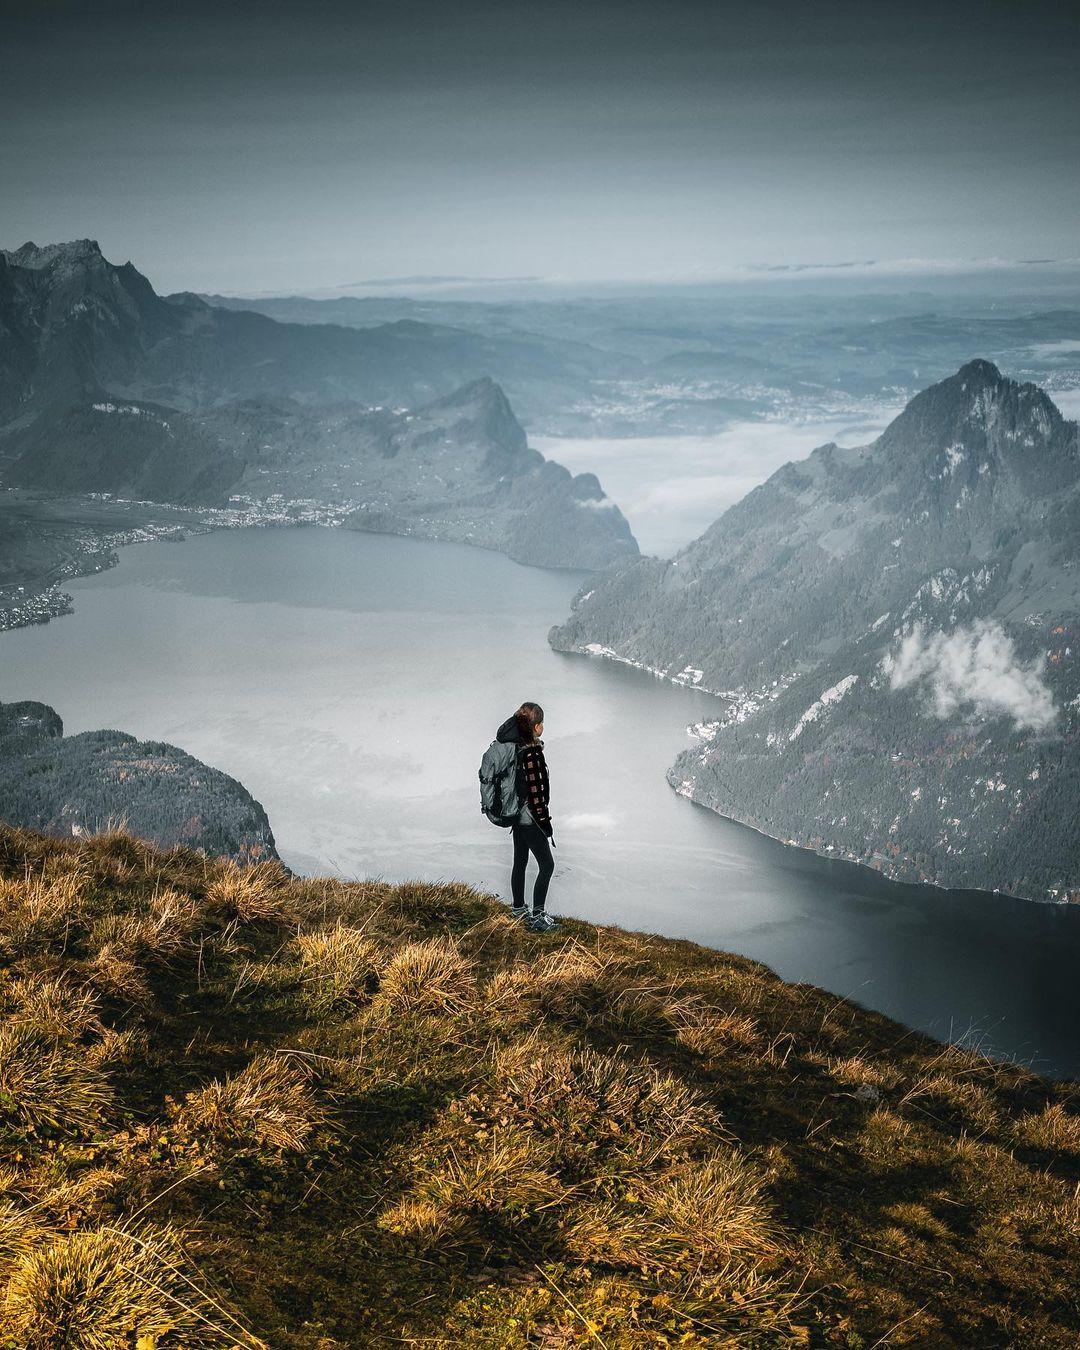 Пейзажи и путешествия на снимках Юрга Хостеттлера